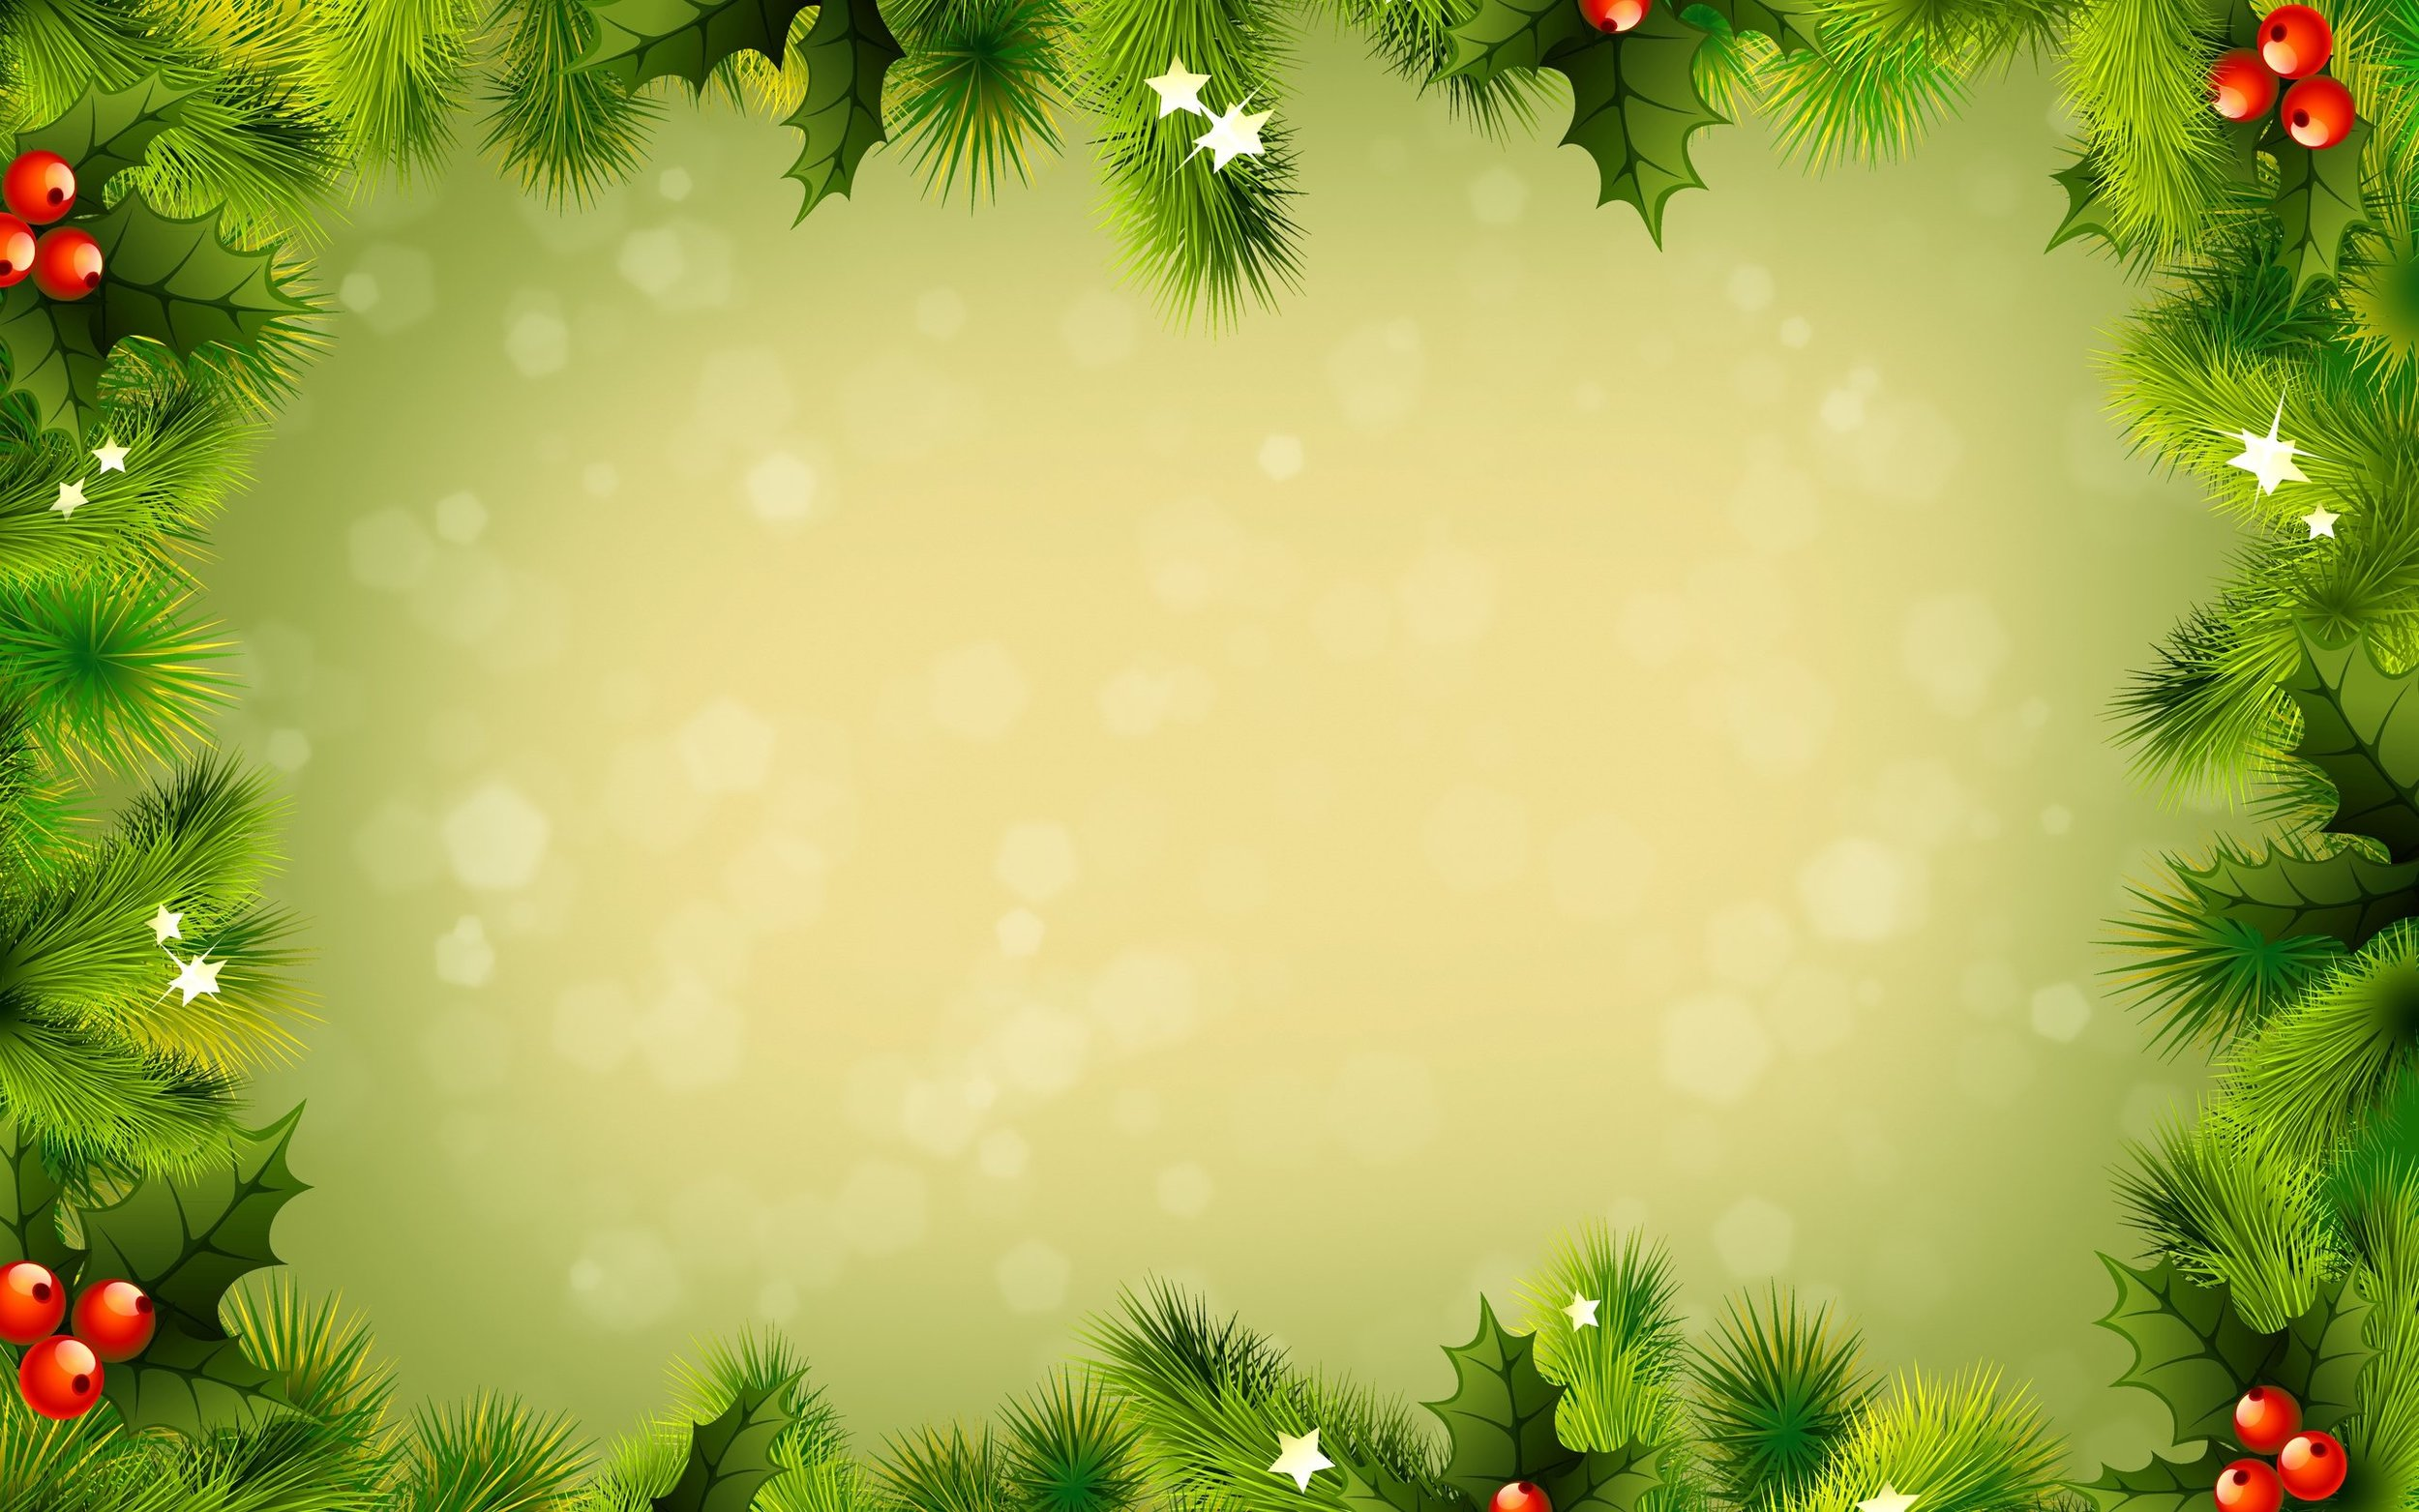 2nd Annual Christmas In Kogan Celebration